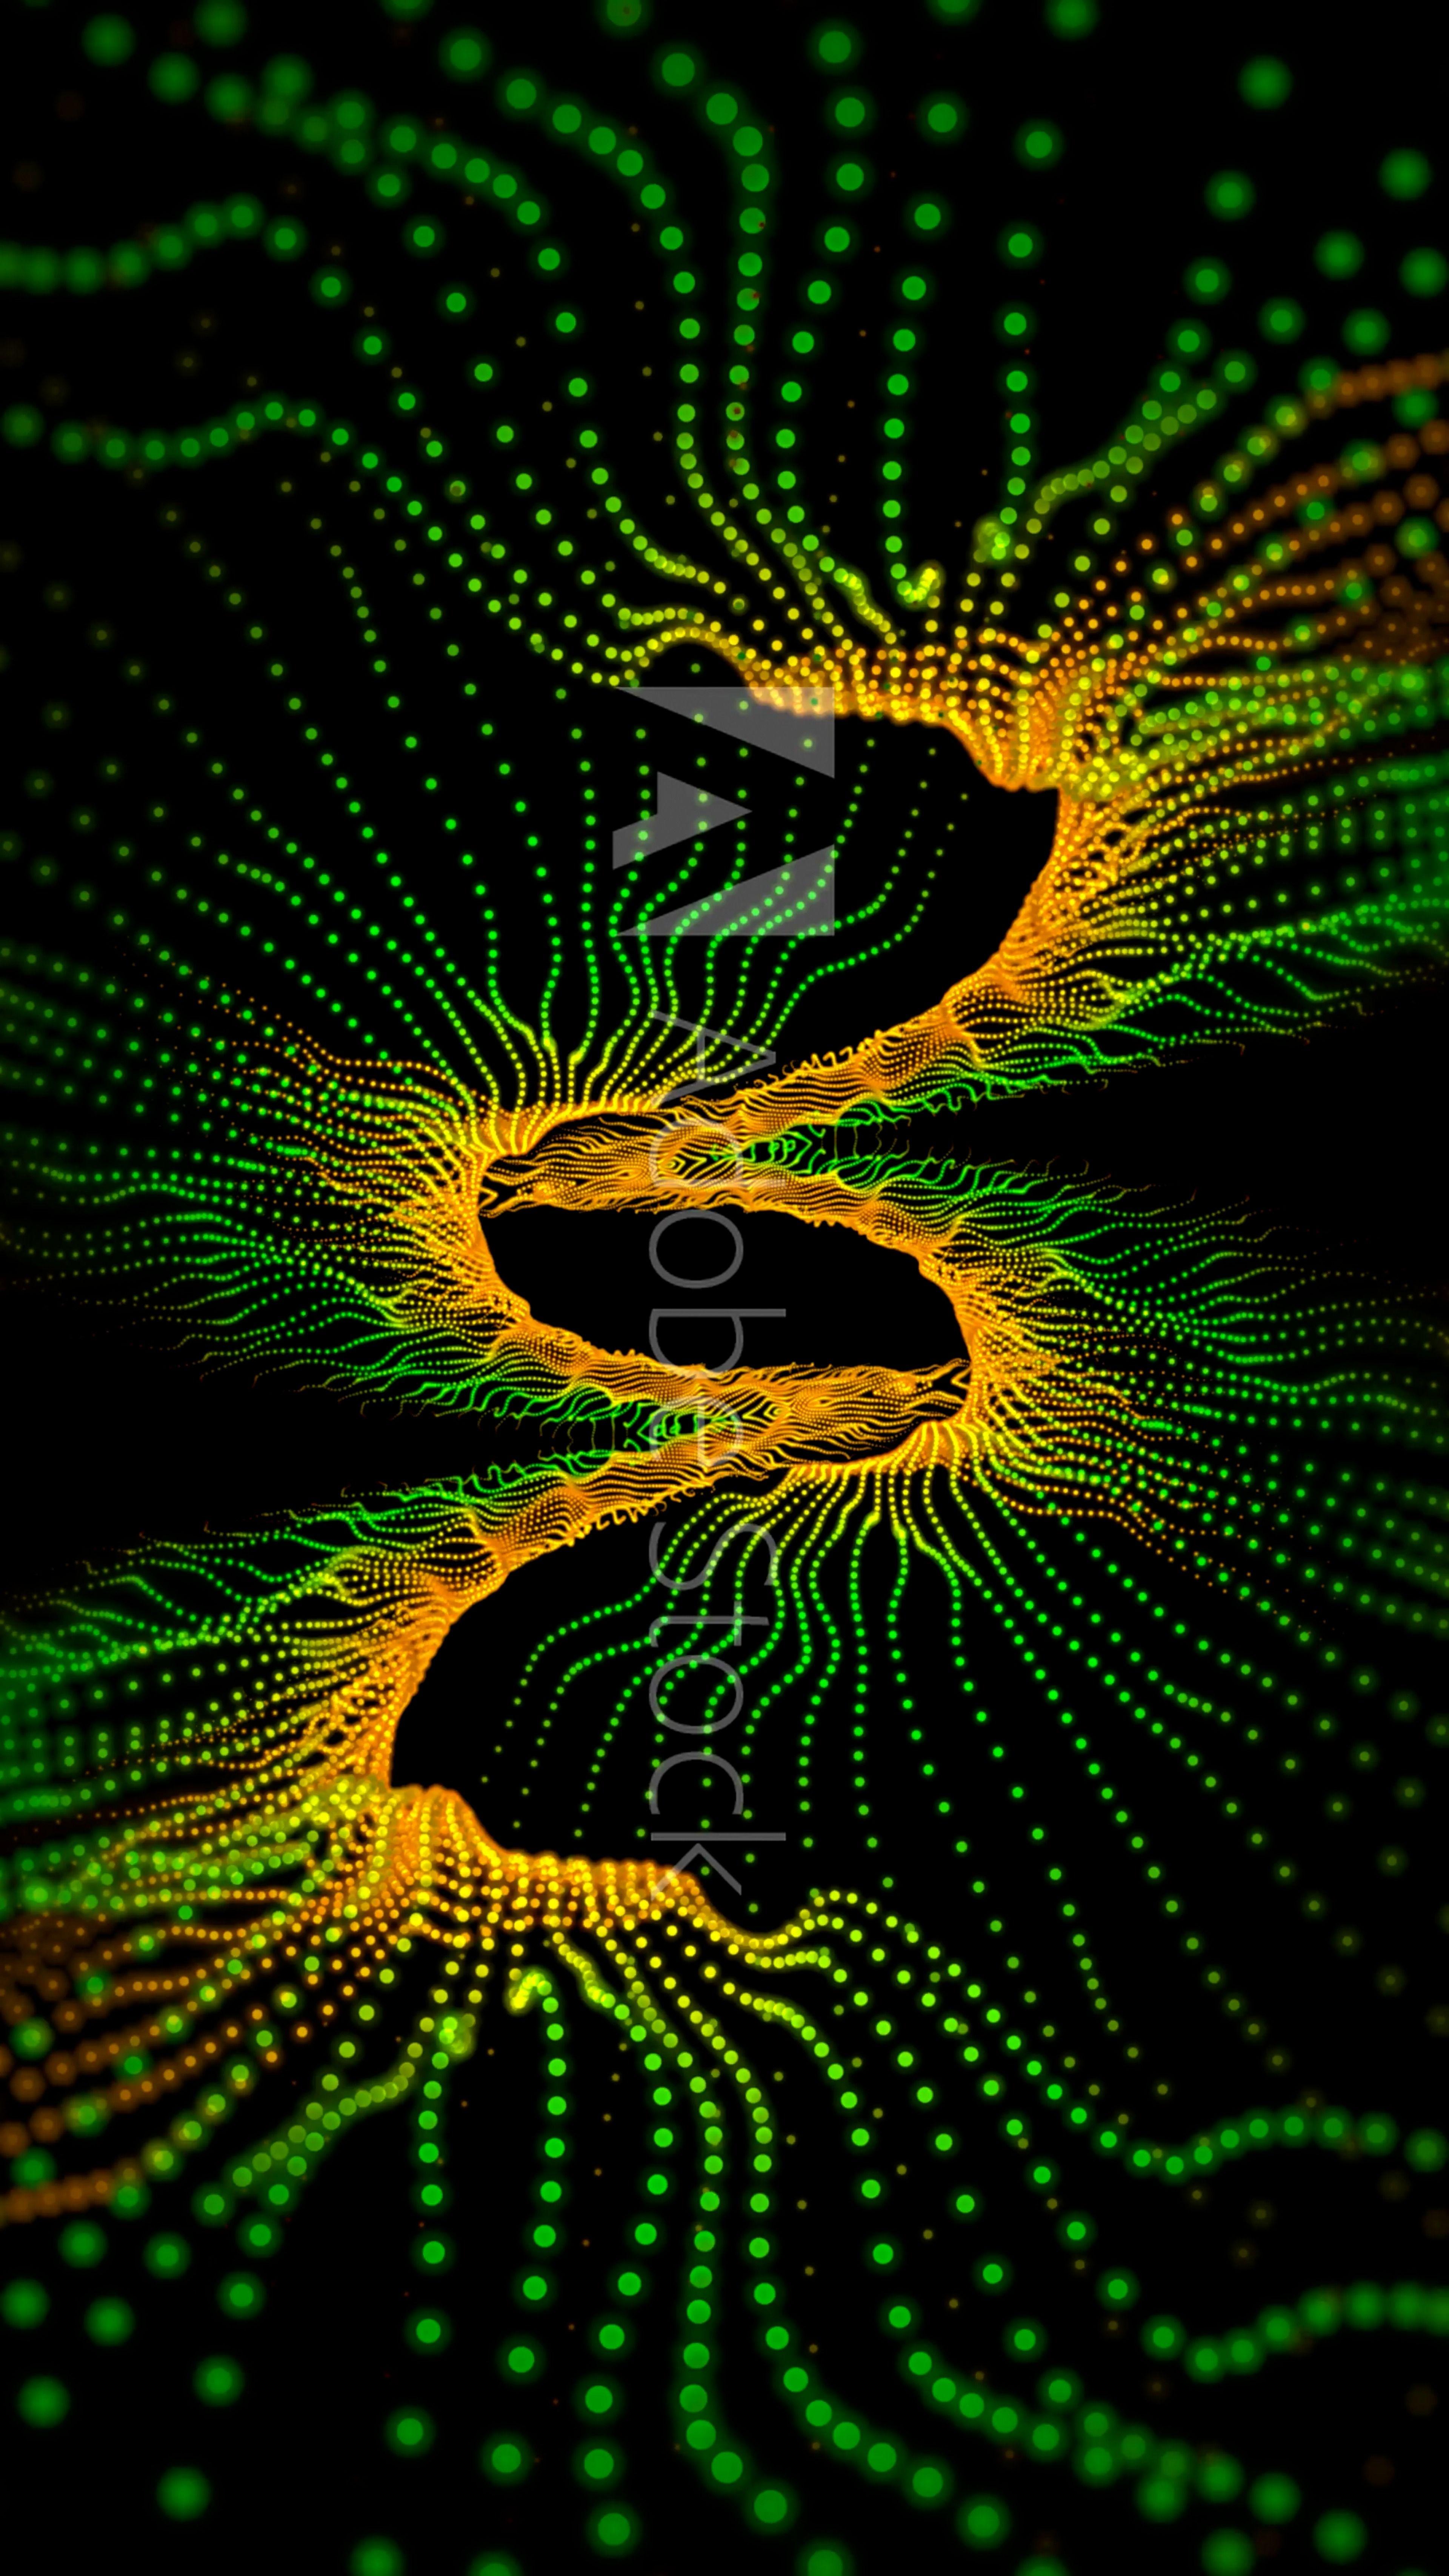 Green Yellow Abstract Fractal Form Abstract Fractal Art Fractal Design